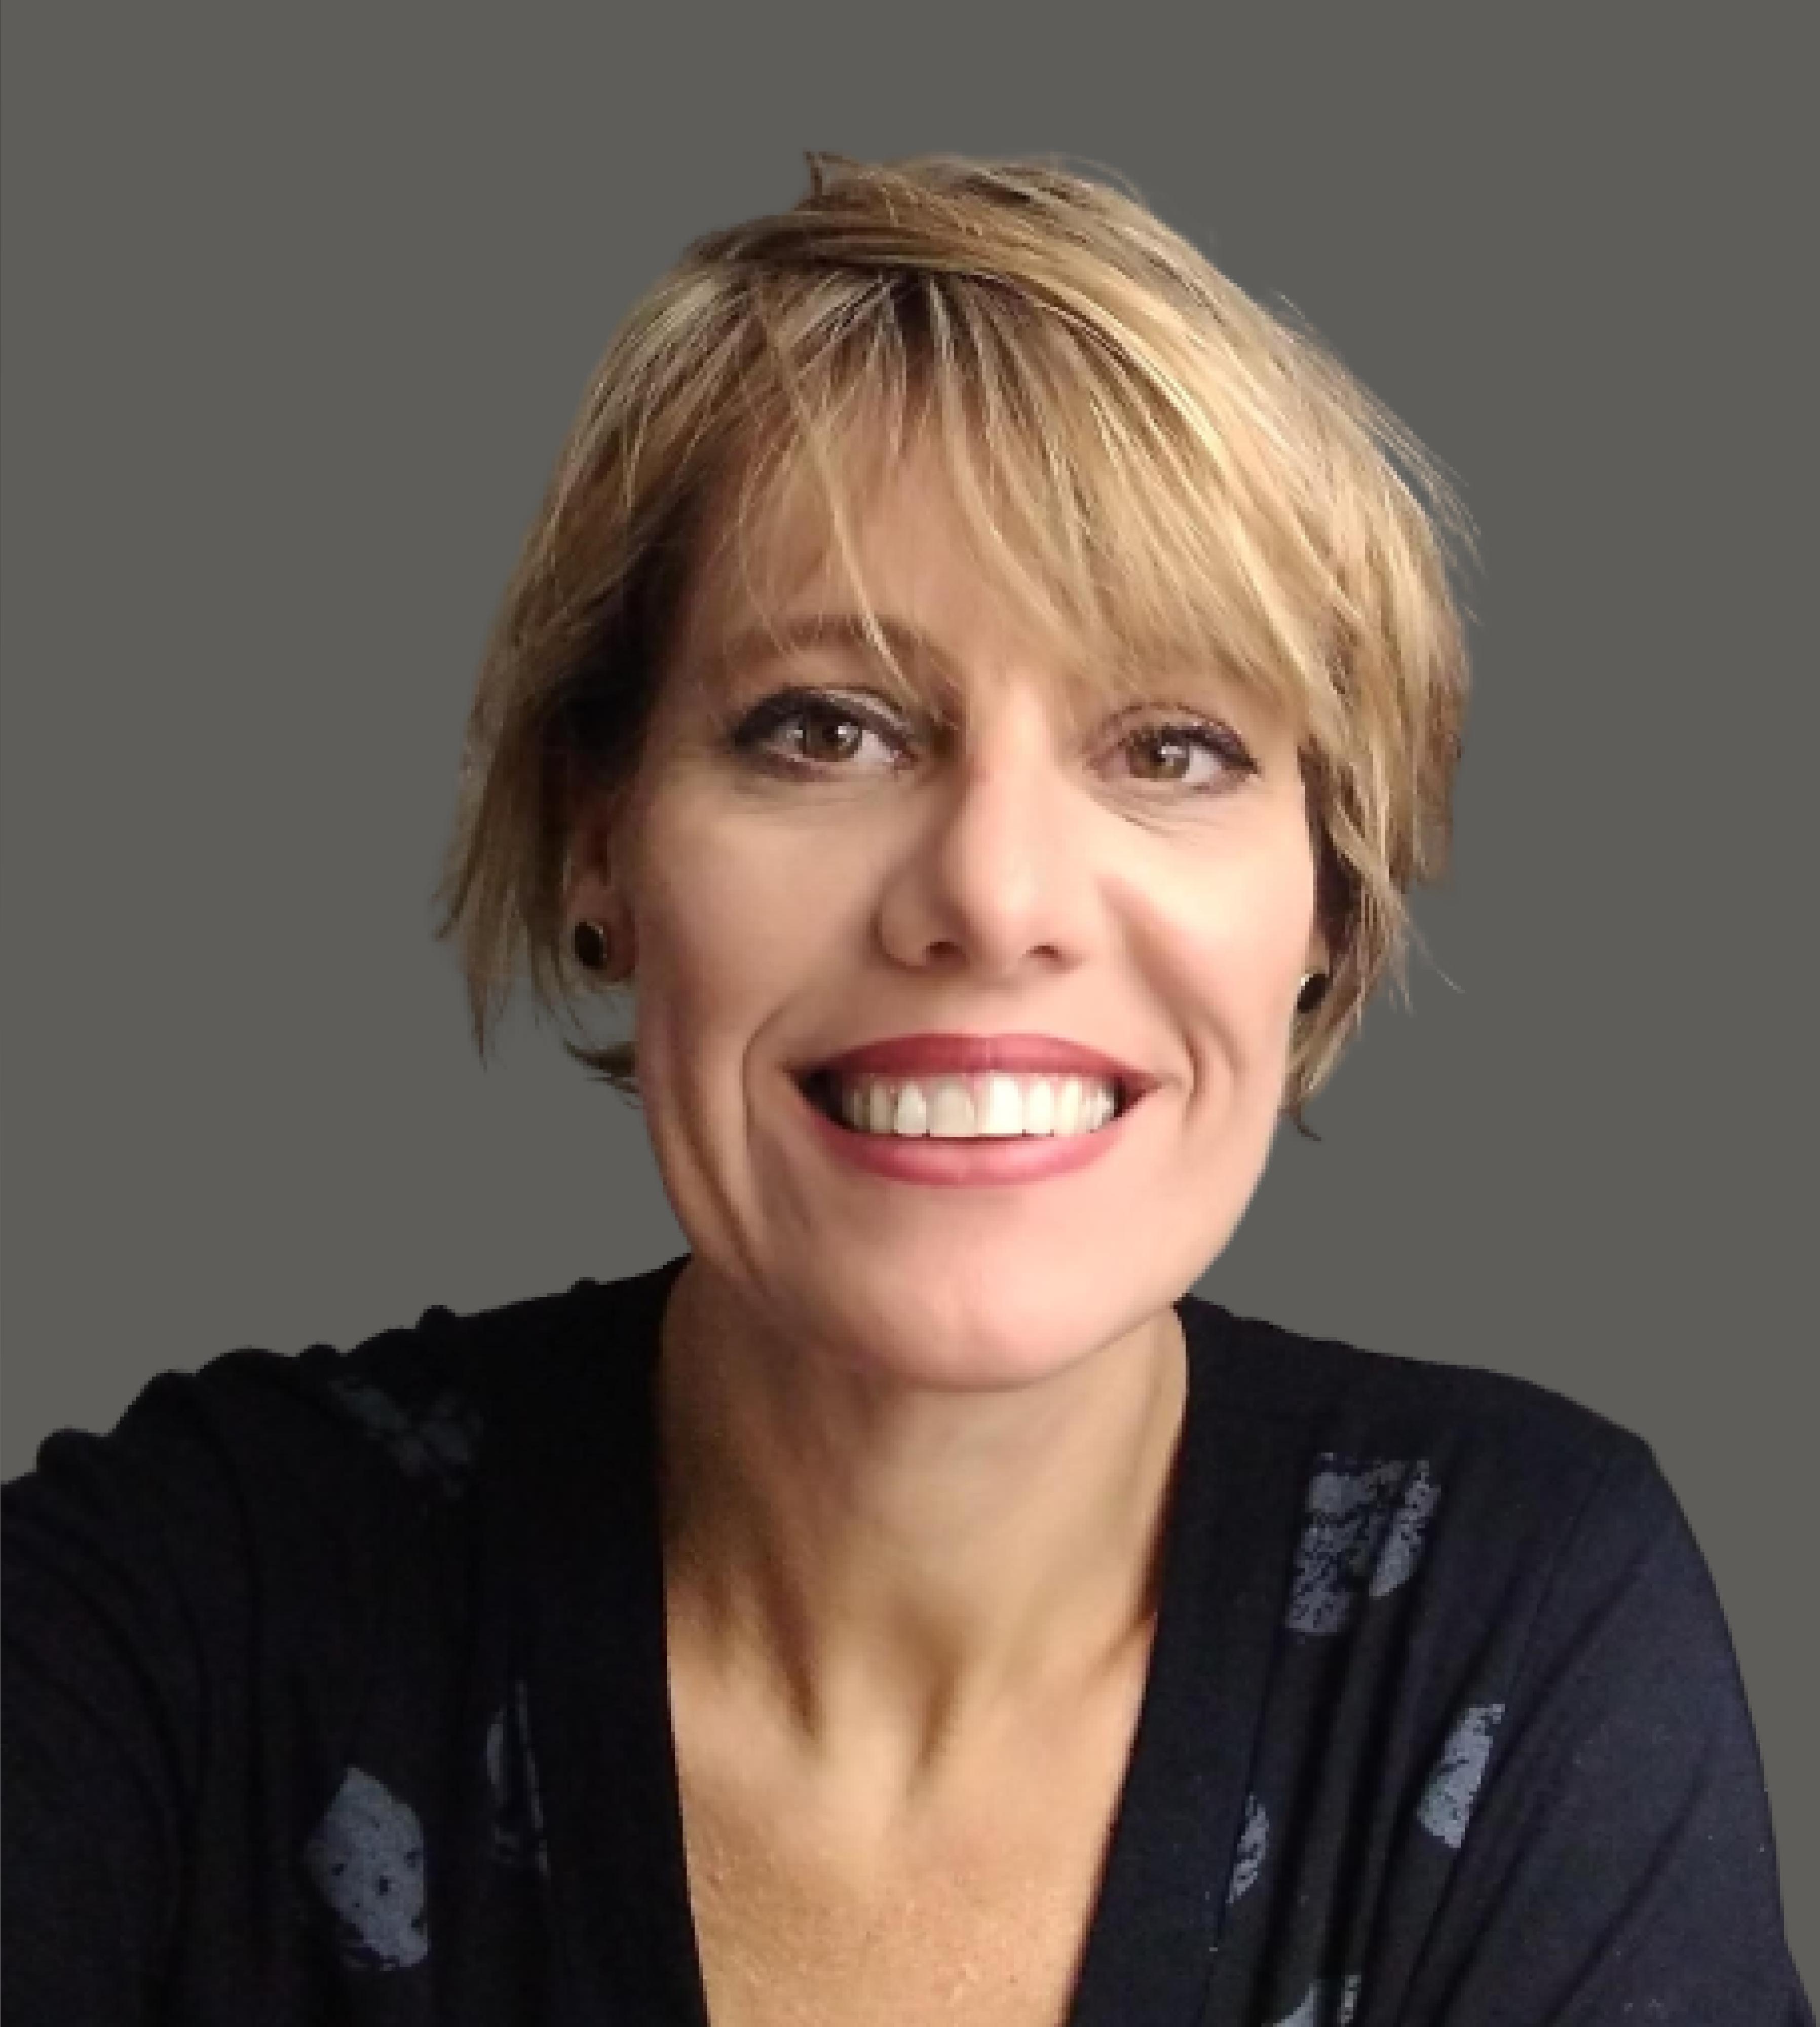 Patricia Guelfi